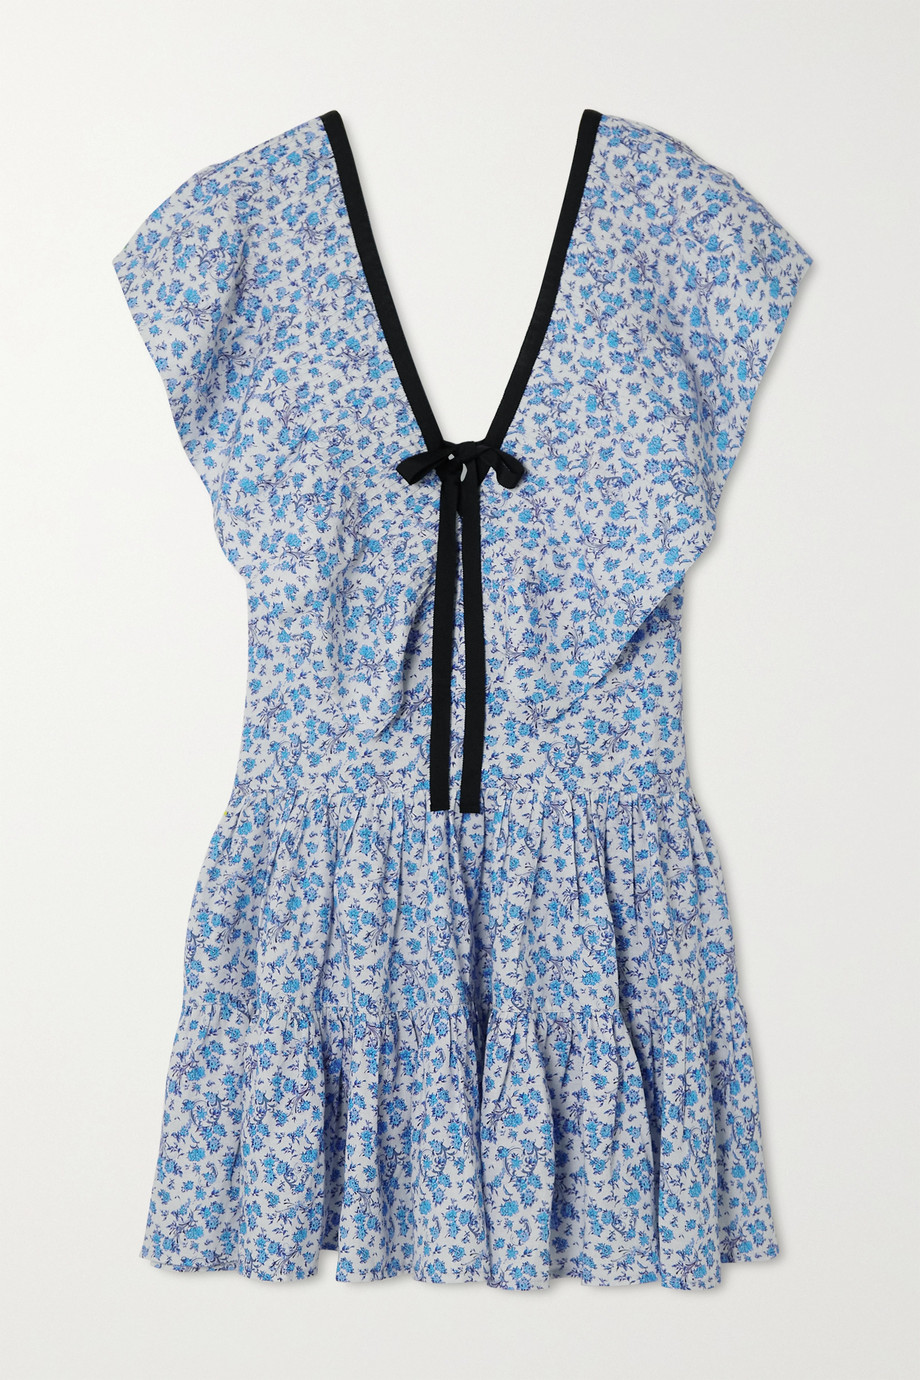 Lug Von Siga Mini-robe en coton et lin mélangés imprimés à volants Cora